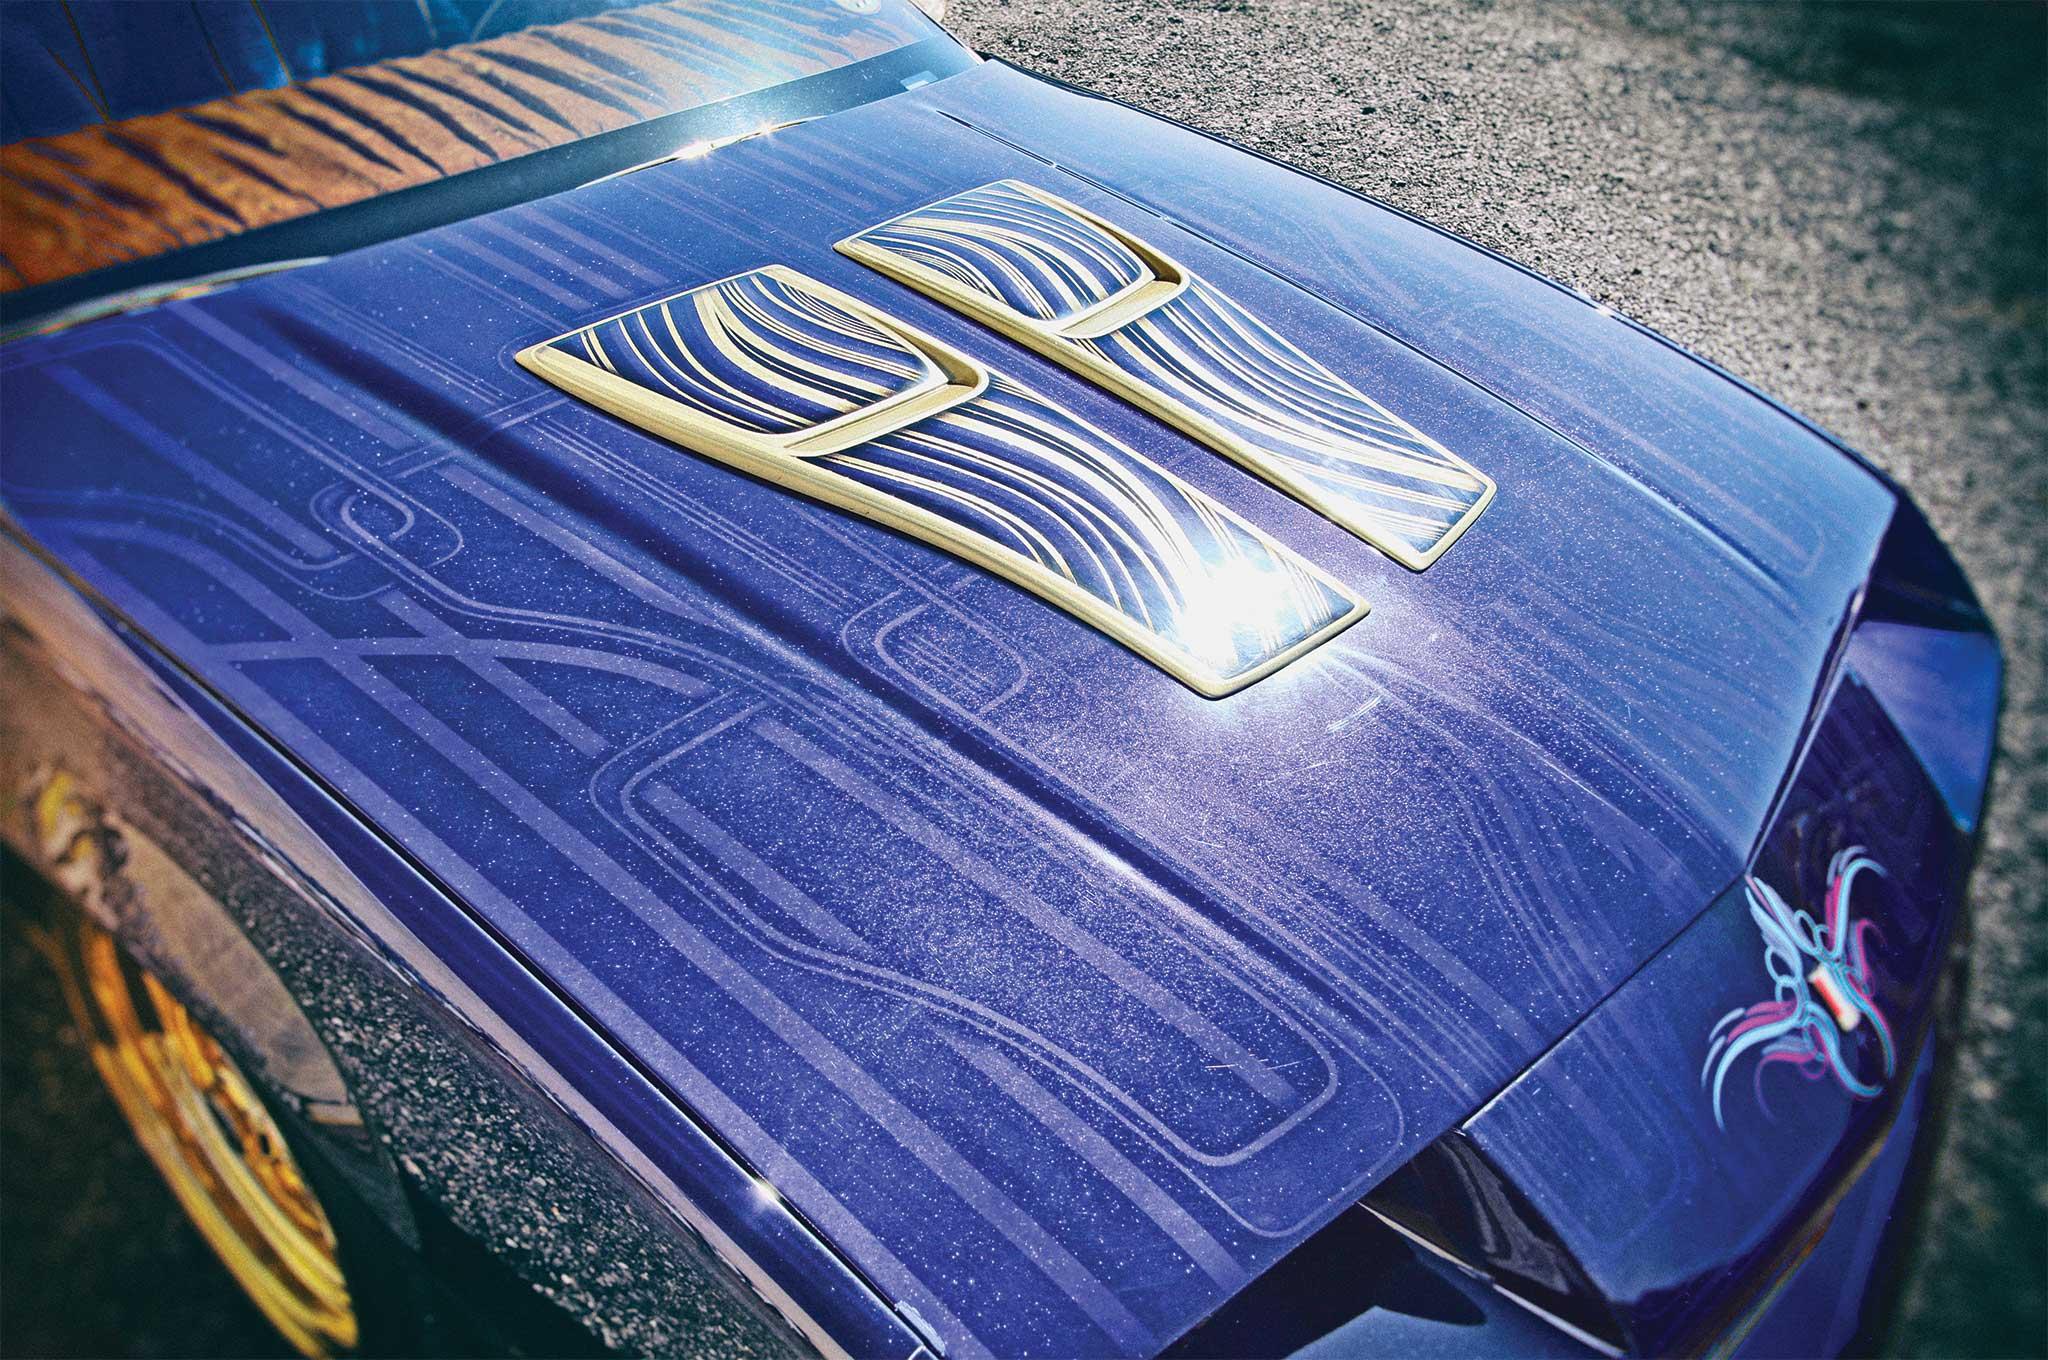 1989 chevrolet camaro iroc z hood graphics 003